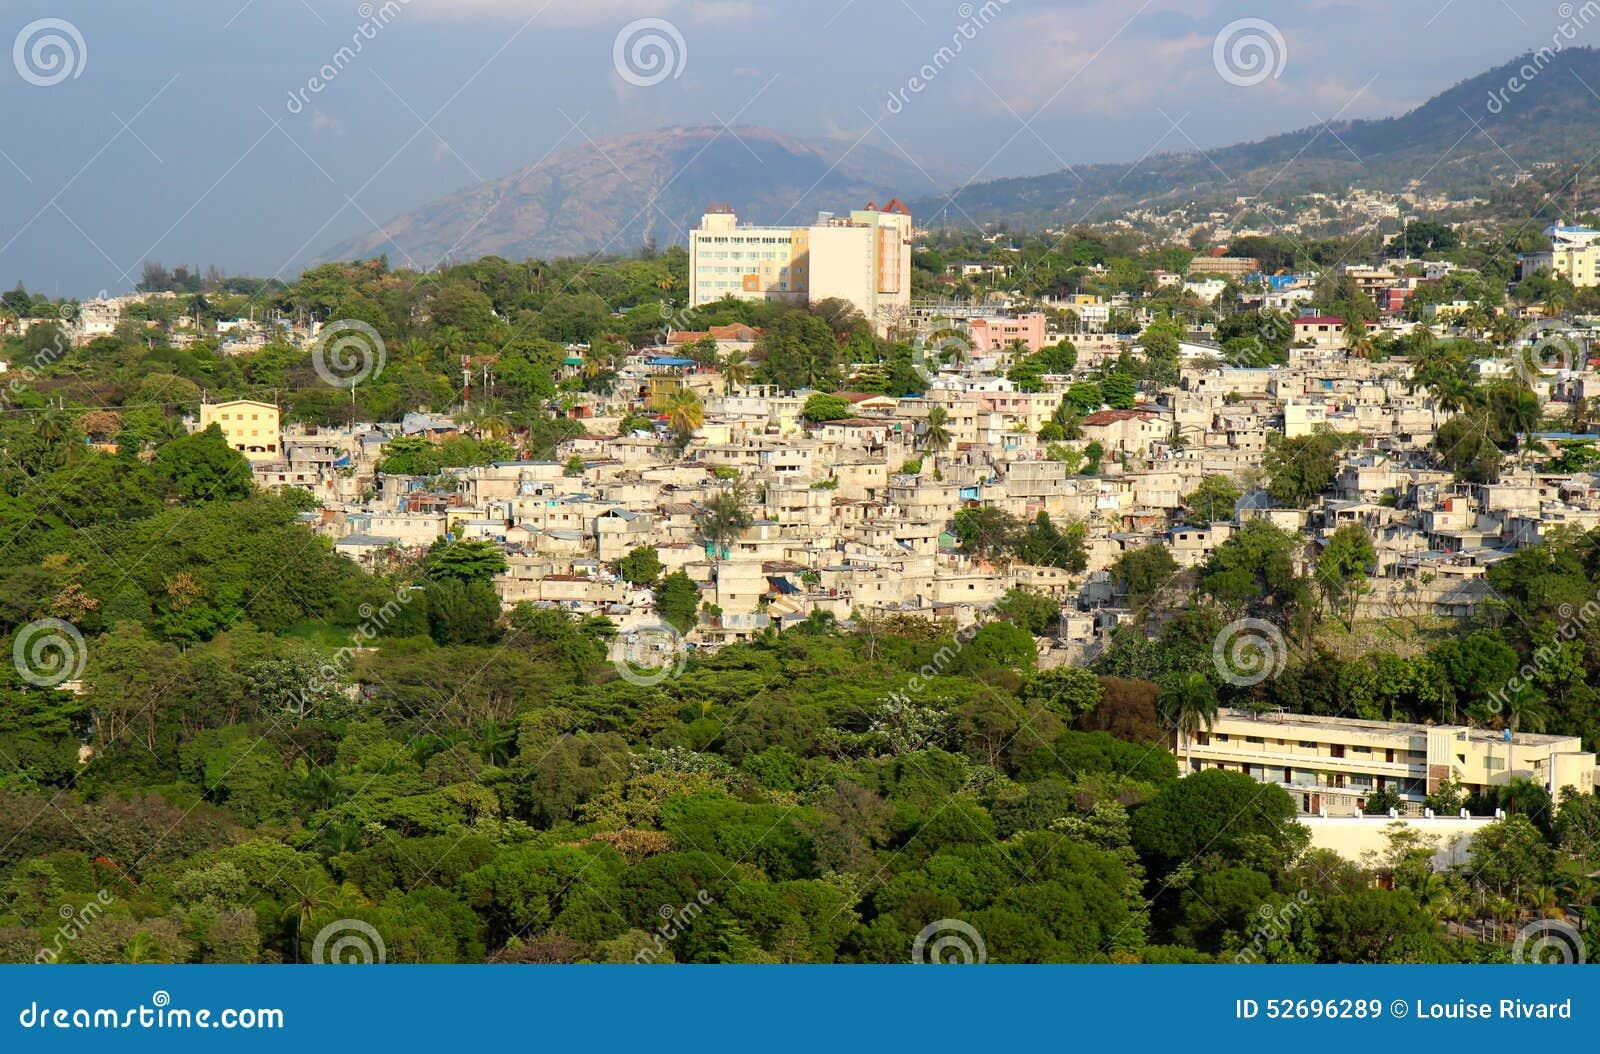 Port-au-Prince trochę domy